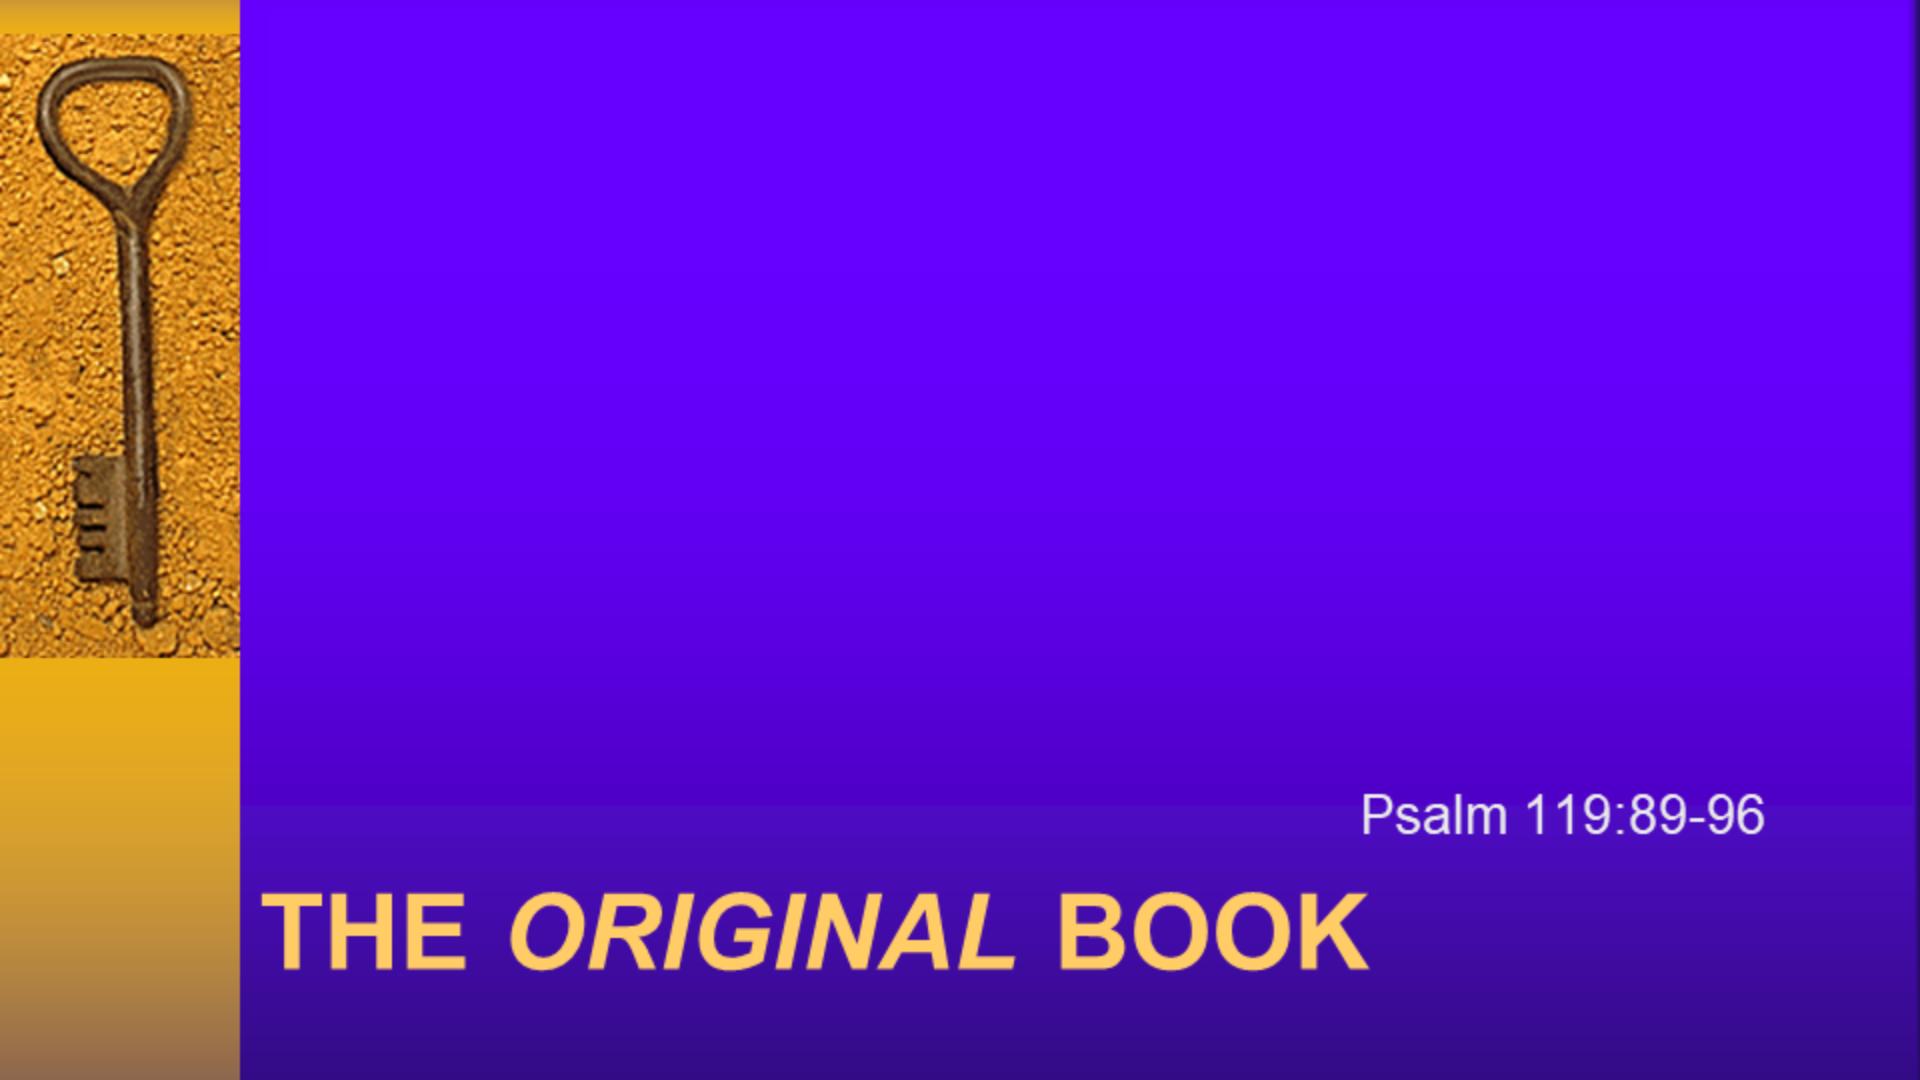 The Original Book| Psalm 119: 89-96 |December 29, 2019